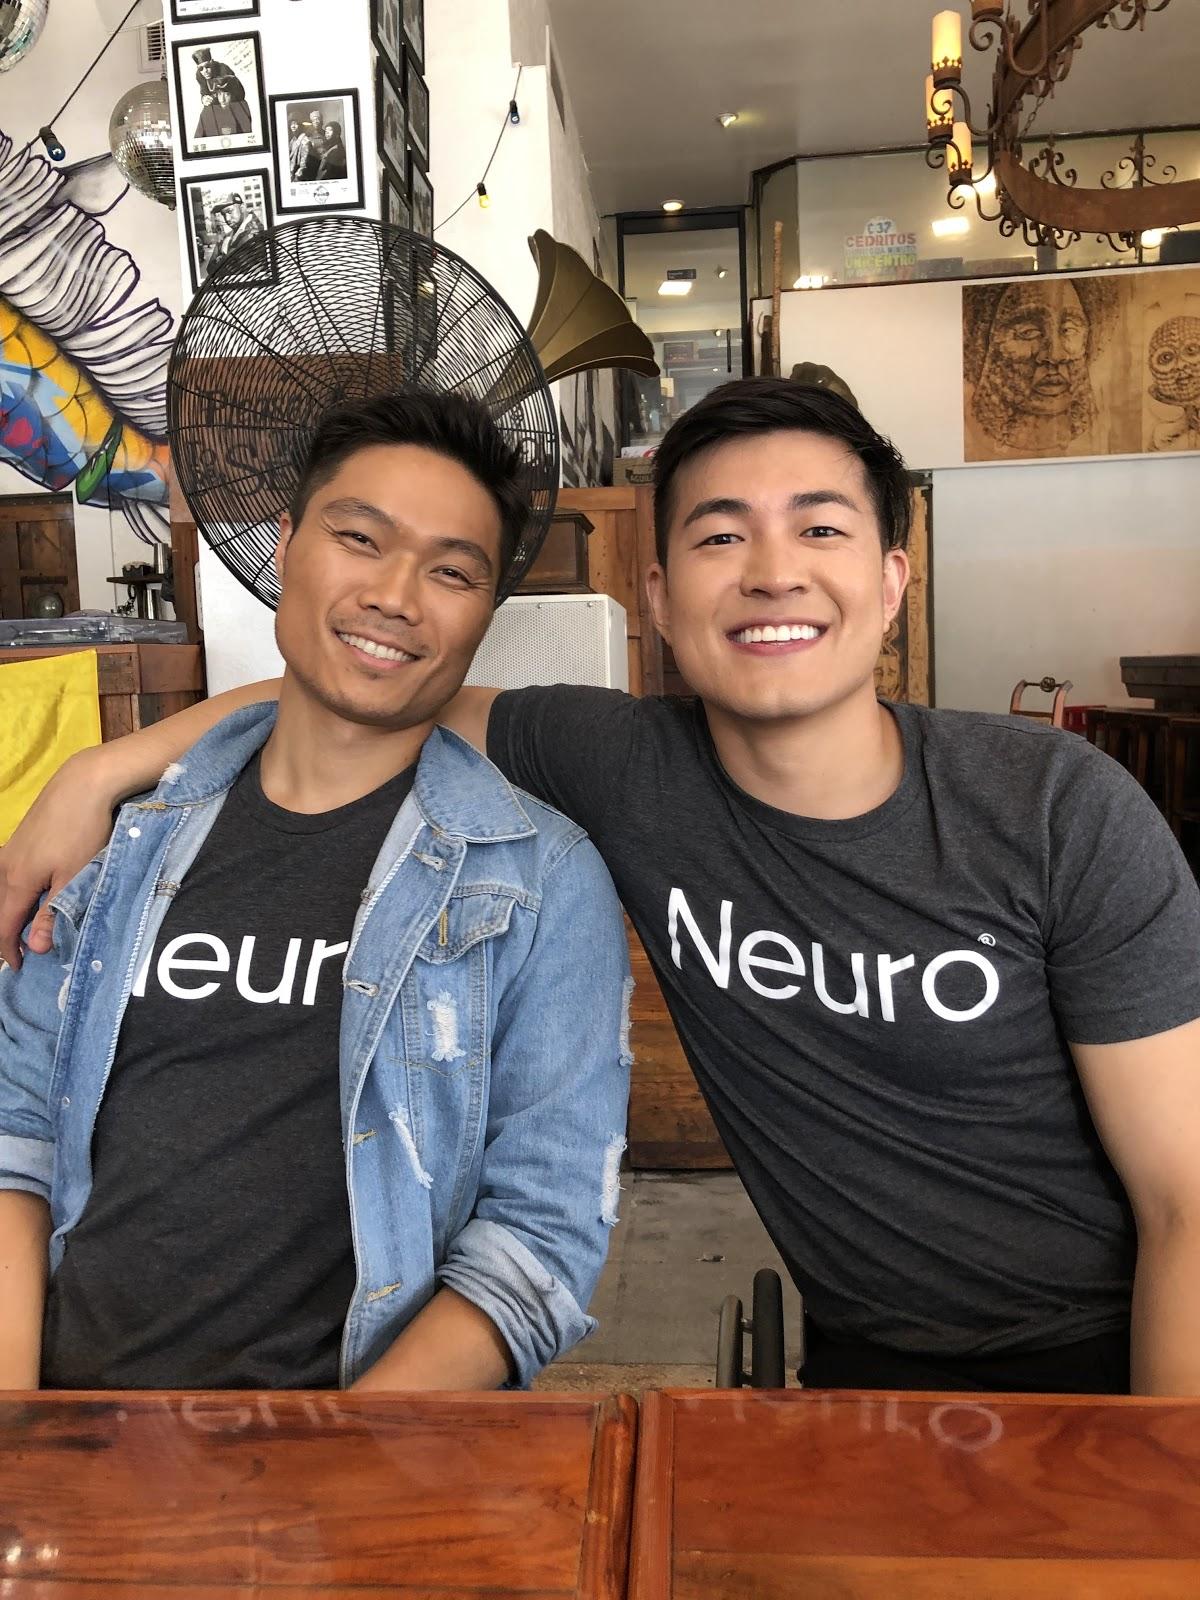 Kent Yoshimura and Ryan Chen, Co-Founders of Neuro, smiling.